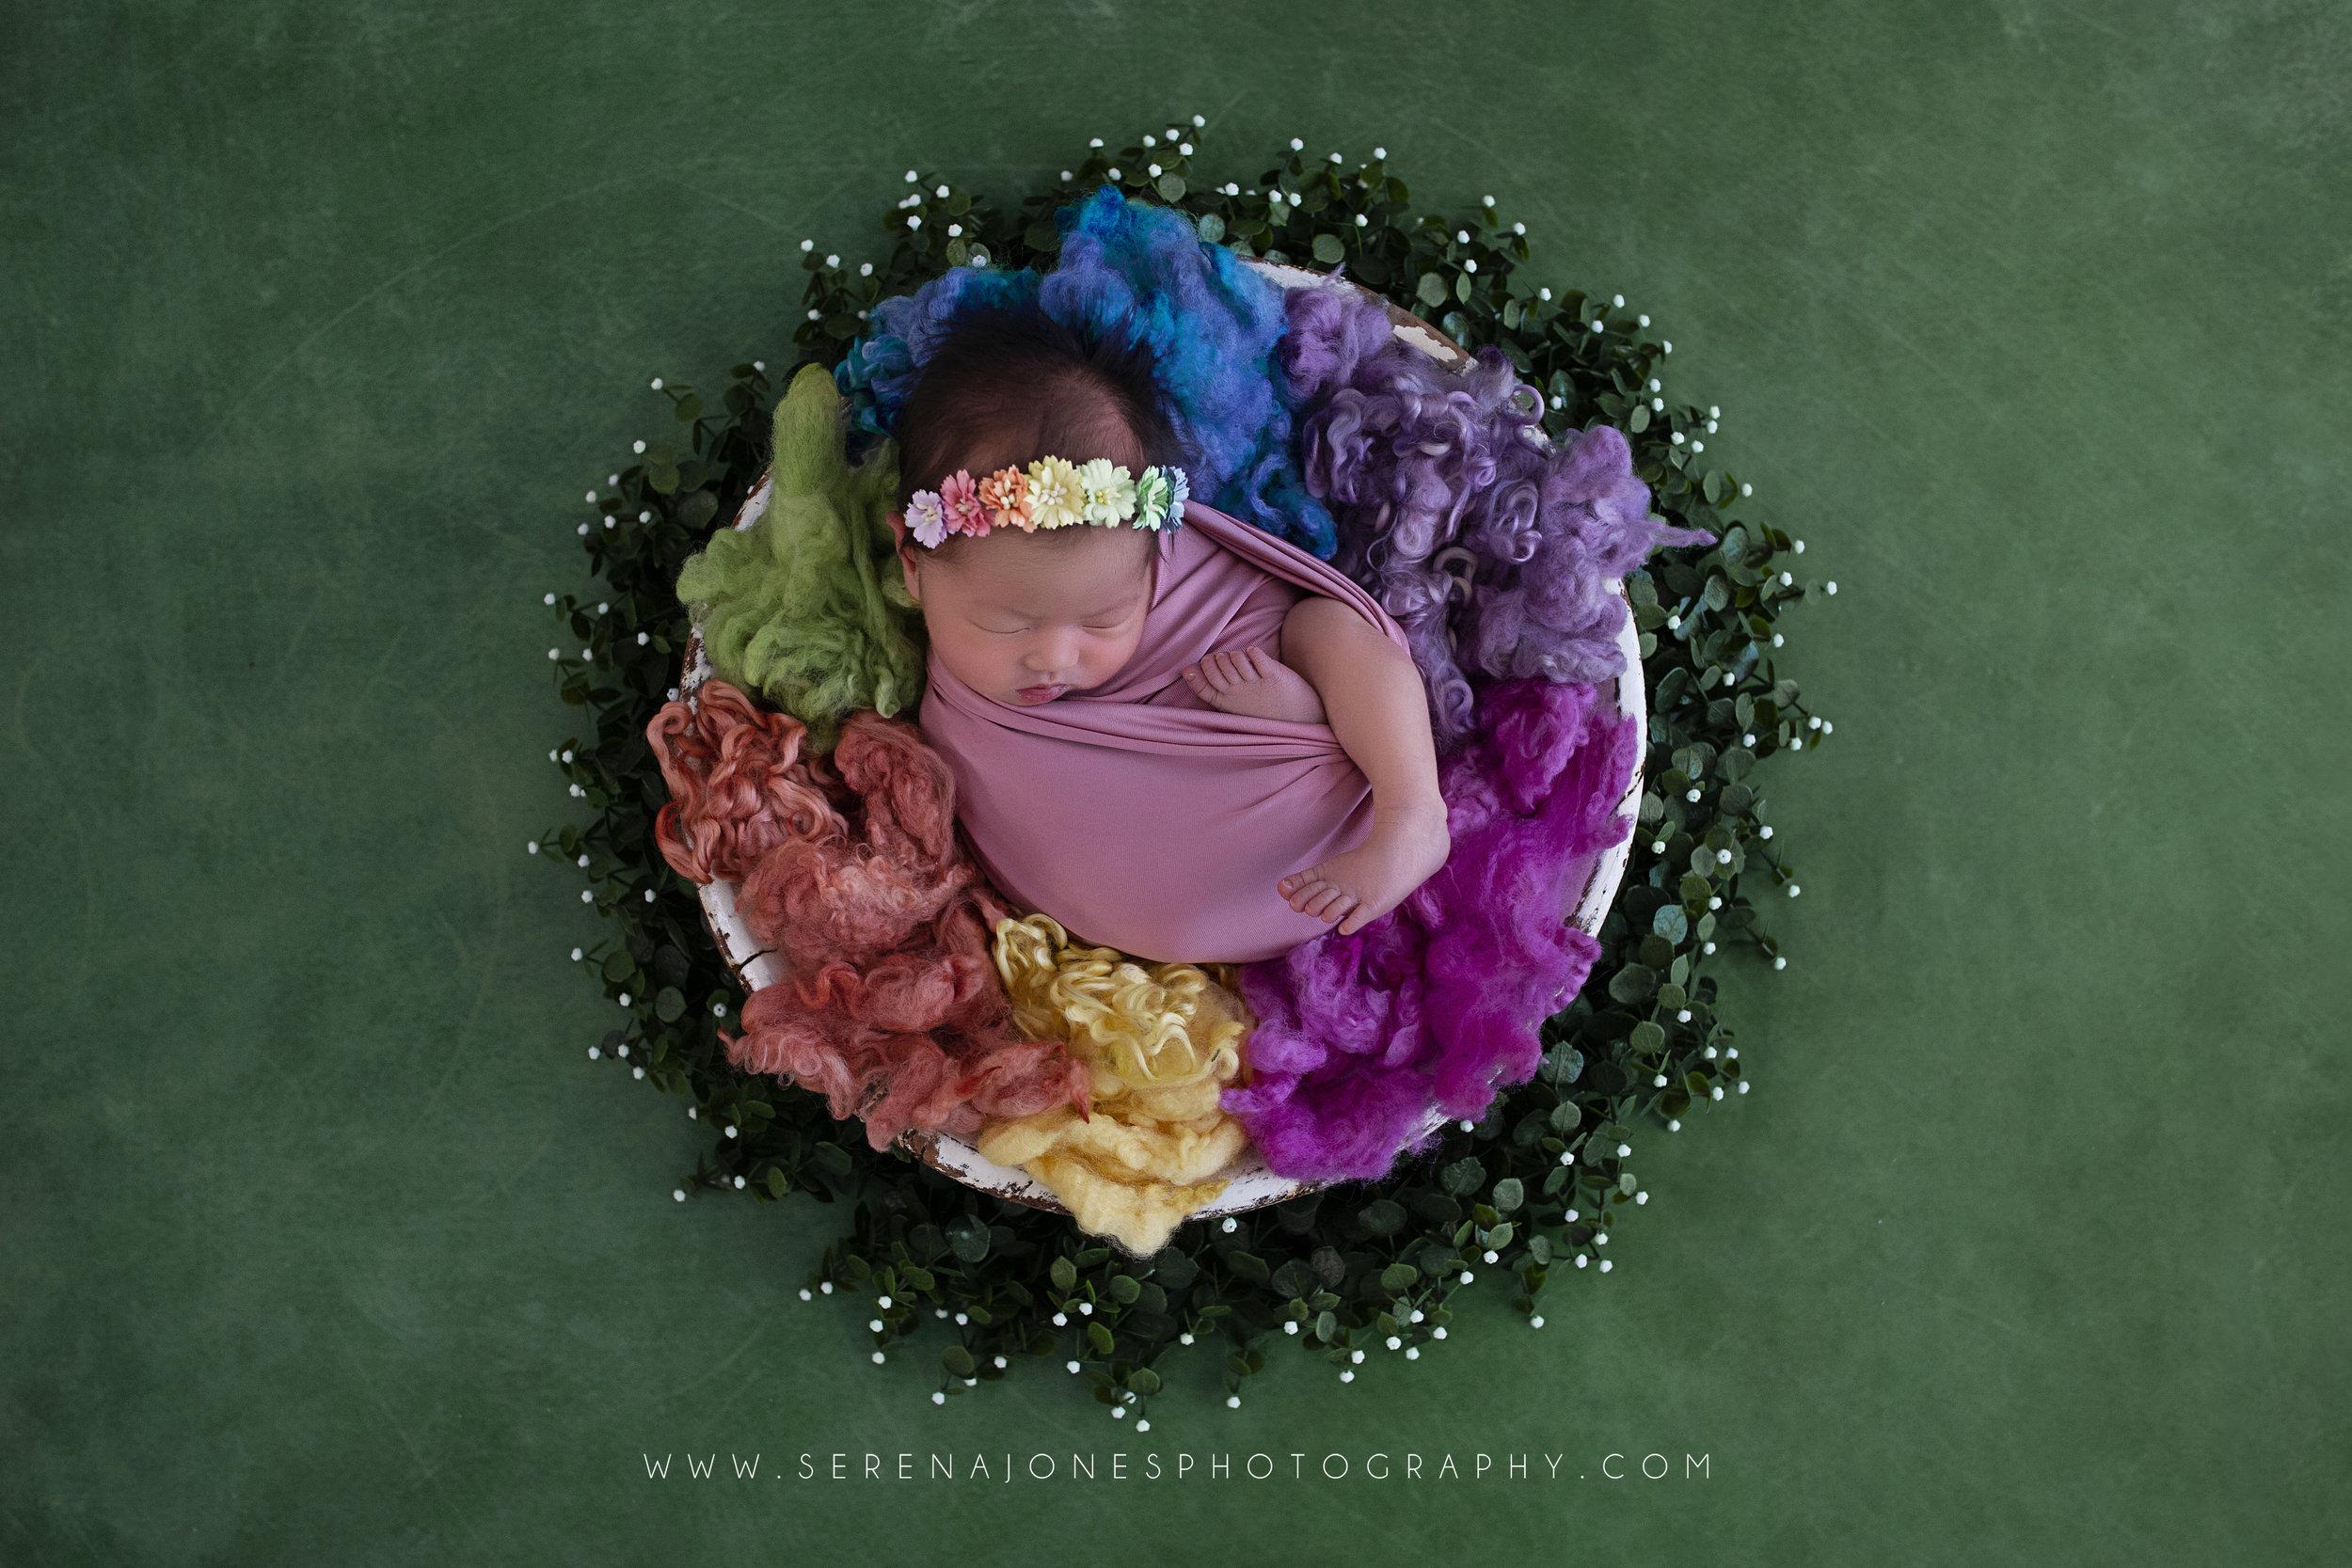 Serena Jones Photography - Sophia Gracielle Irawan - 4 Fb.jpg